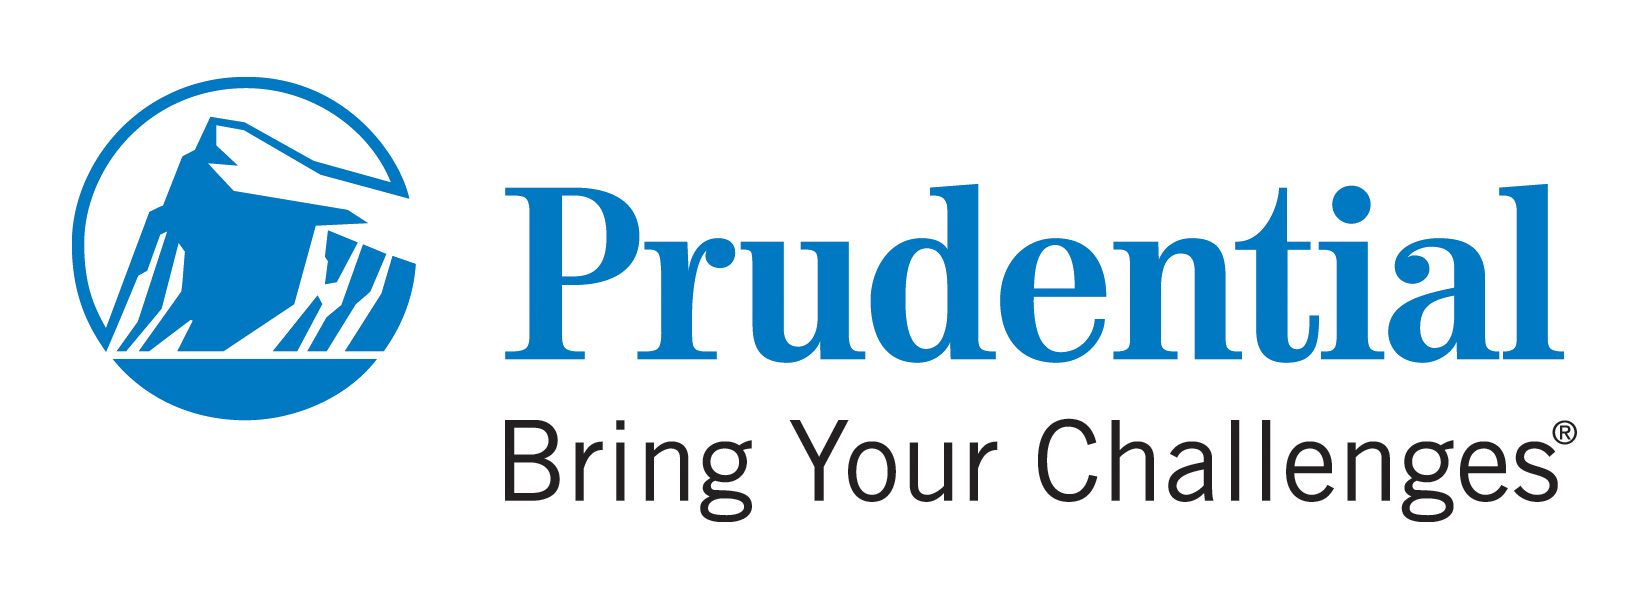 PruBYC_BlueBlack_R.jpg